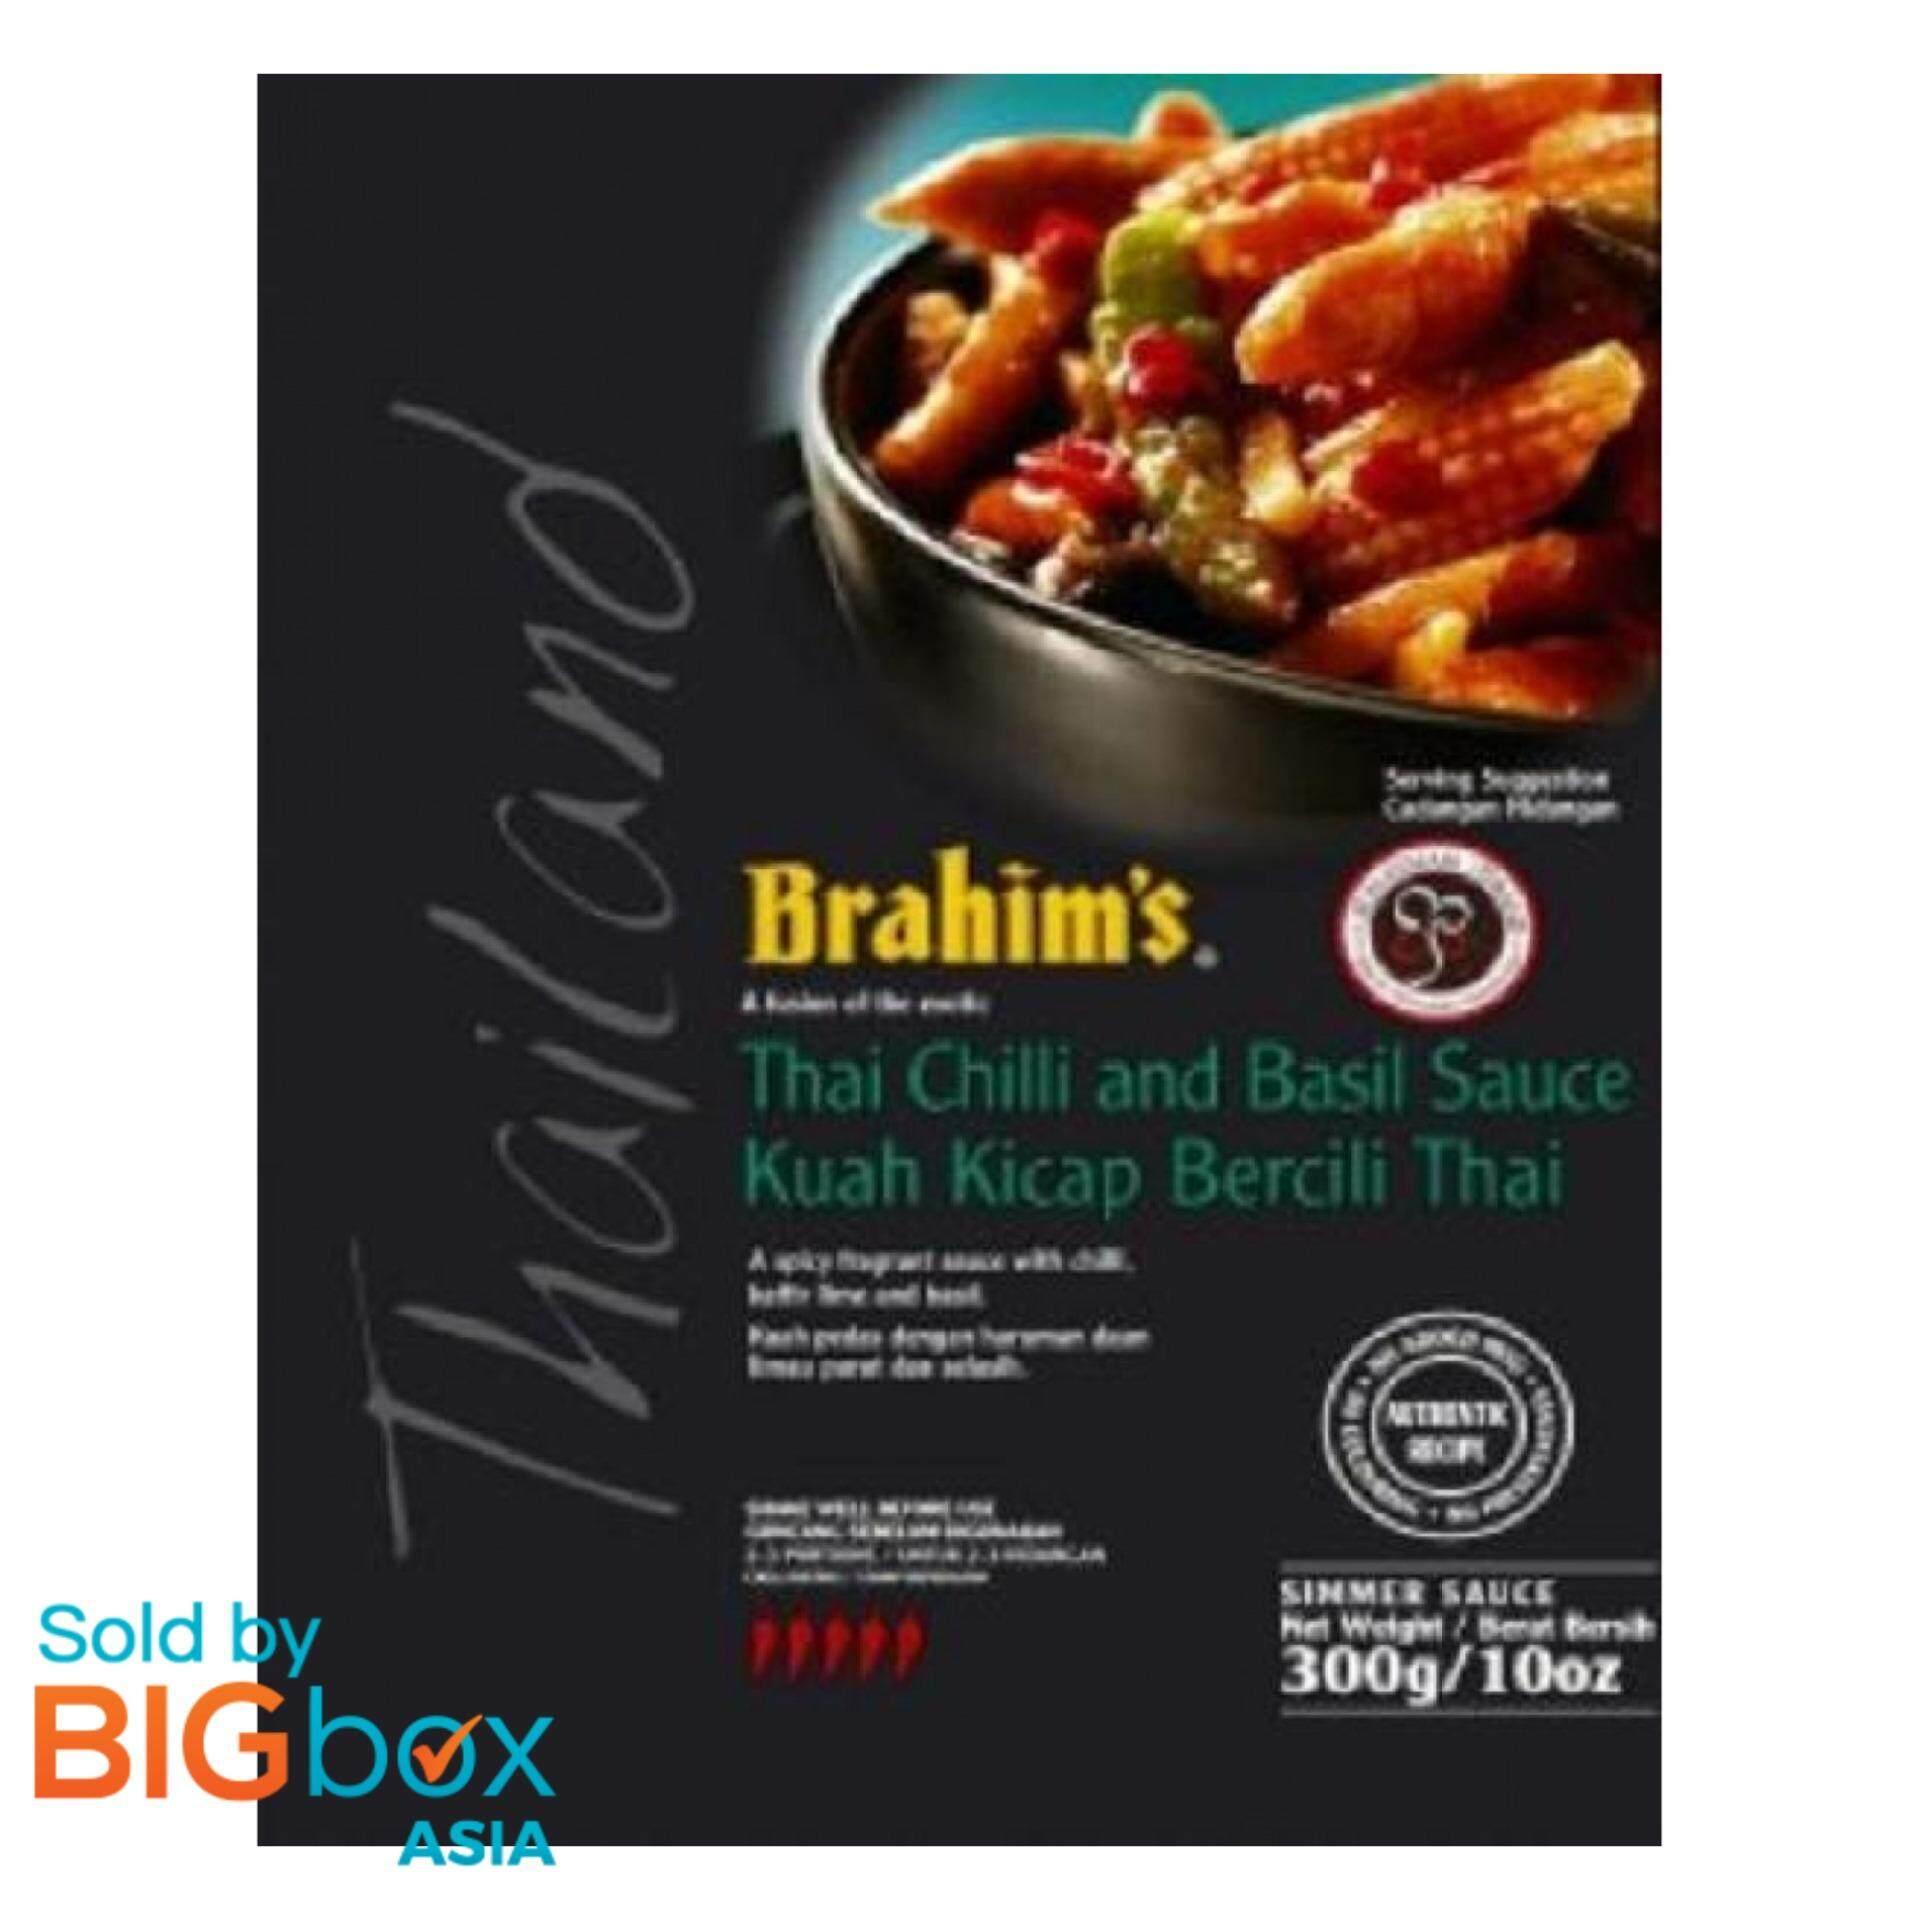 [BIGBox Asia] Brahims Thai Chili Sauce/Kuah Kicap Bercili Thai 300g - Malaysia